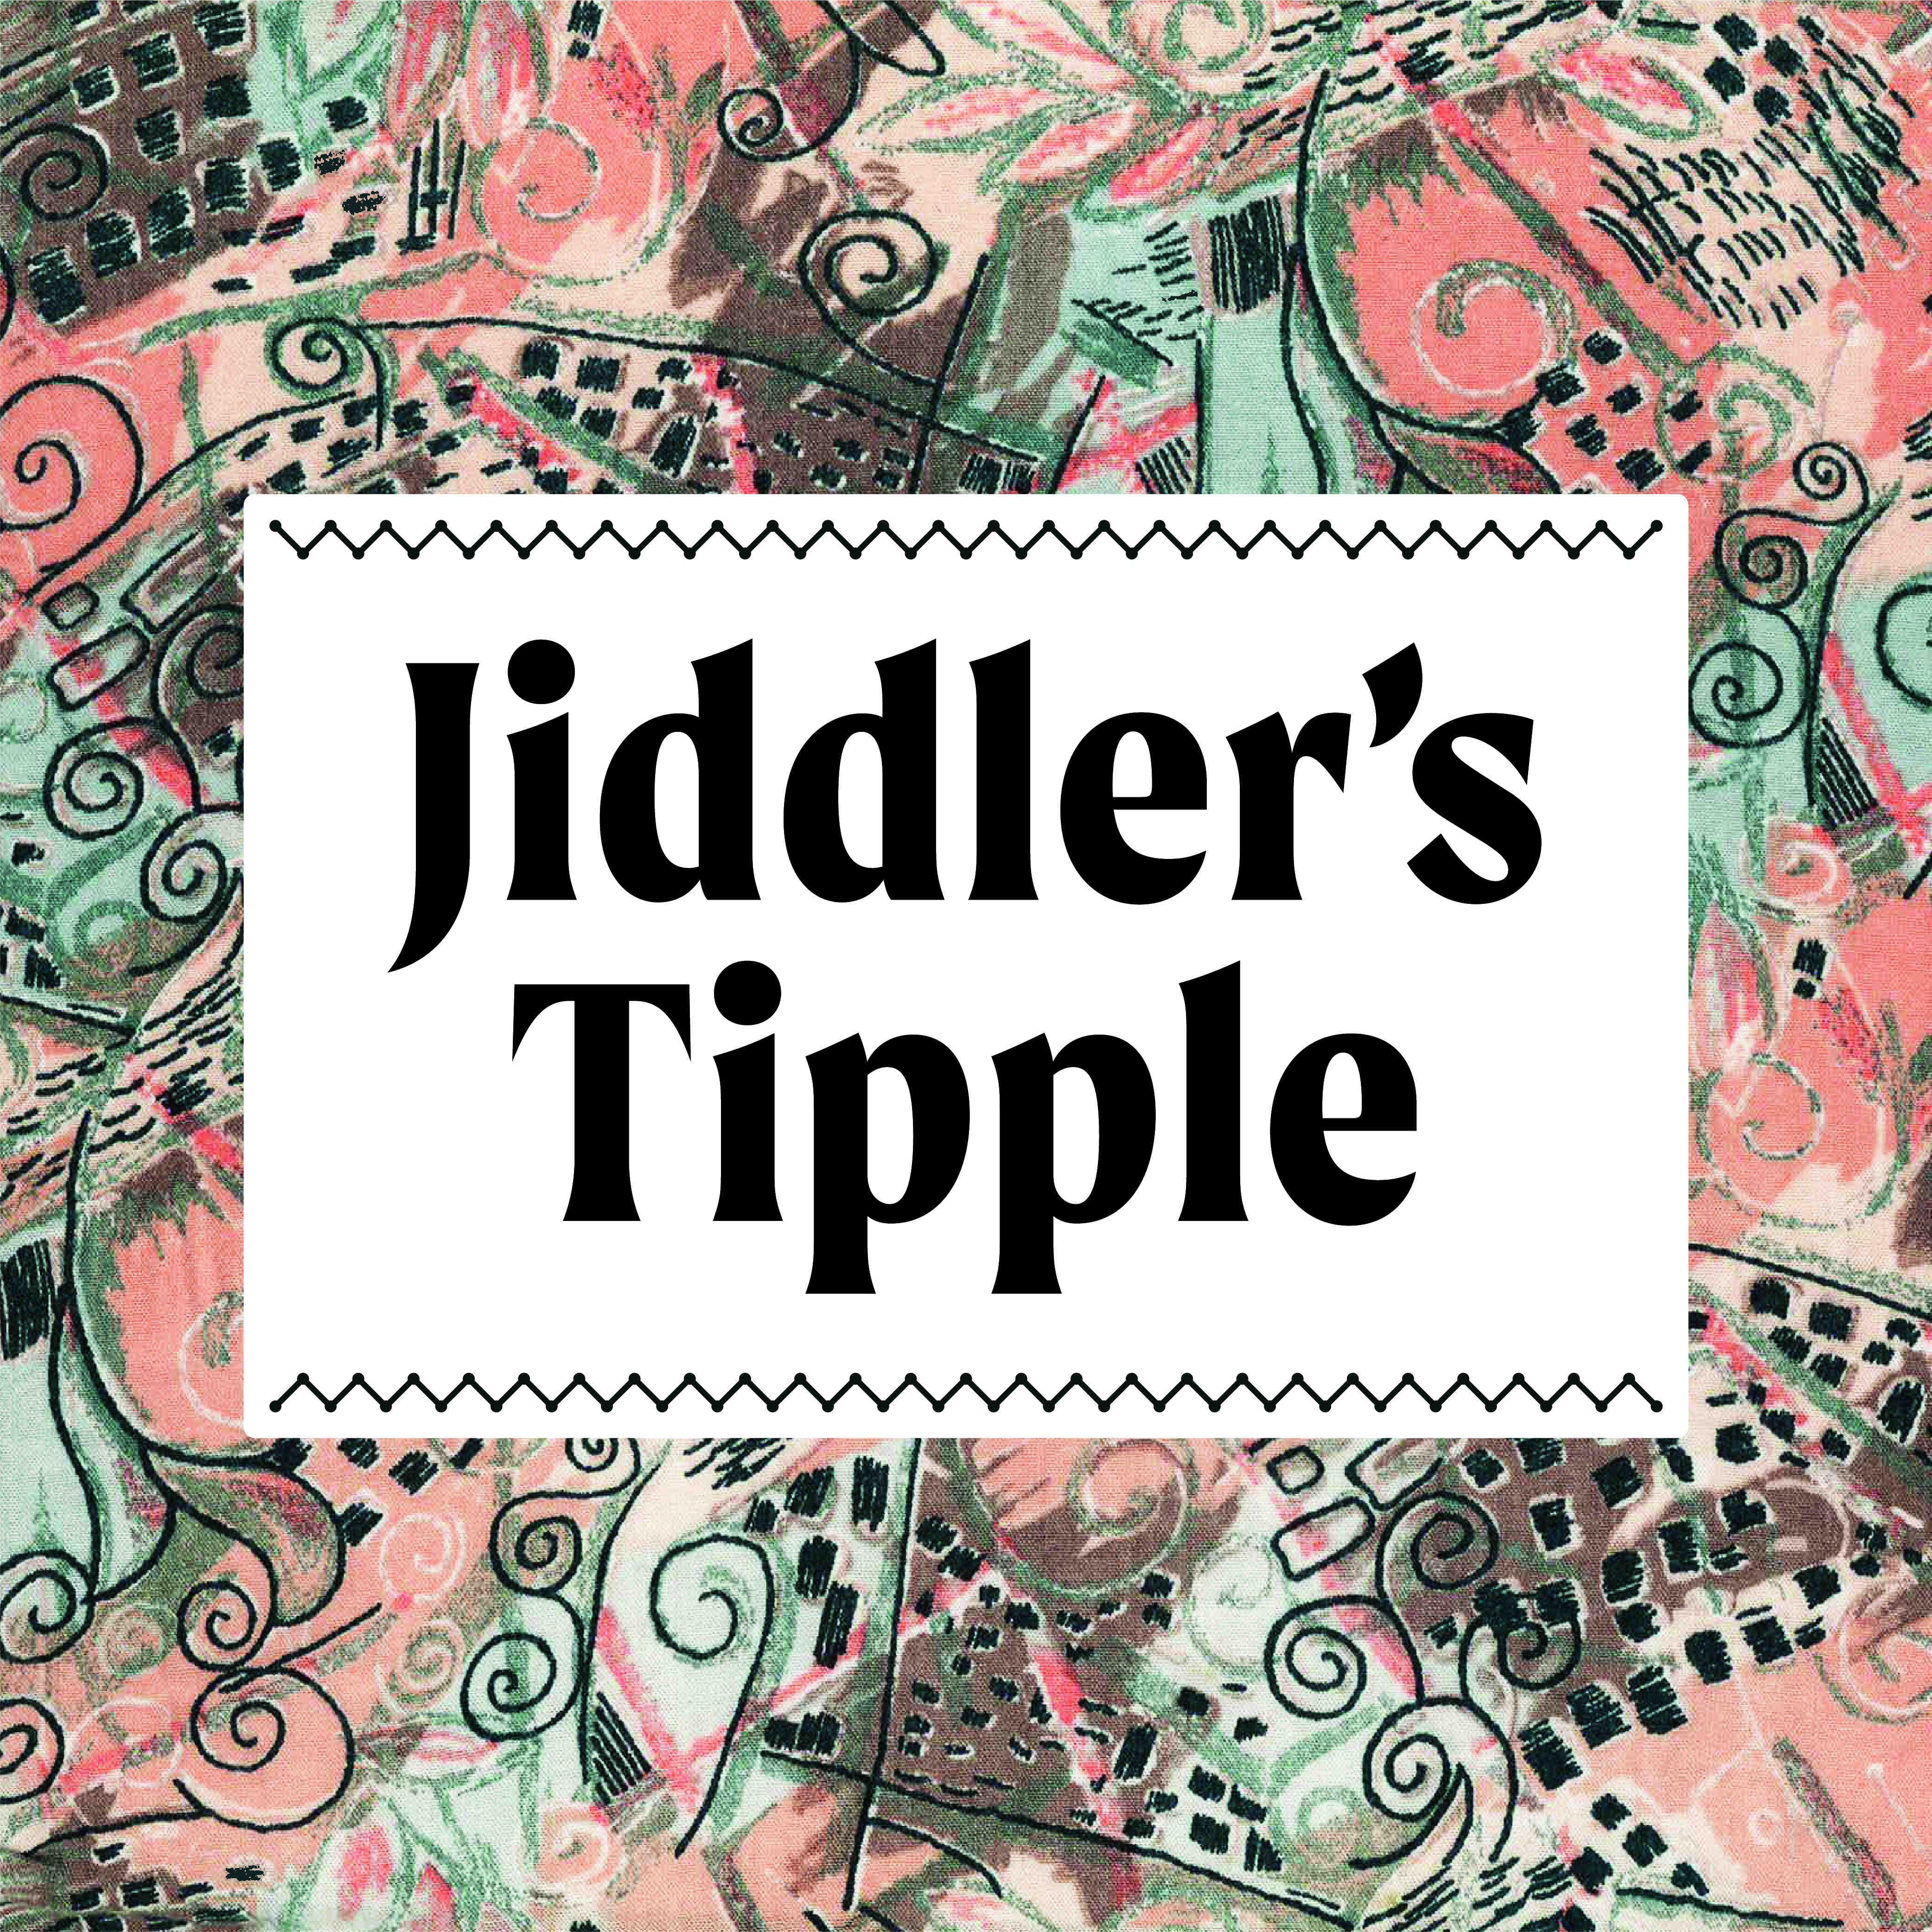 Jiddler's Tipple Craft Beer